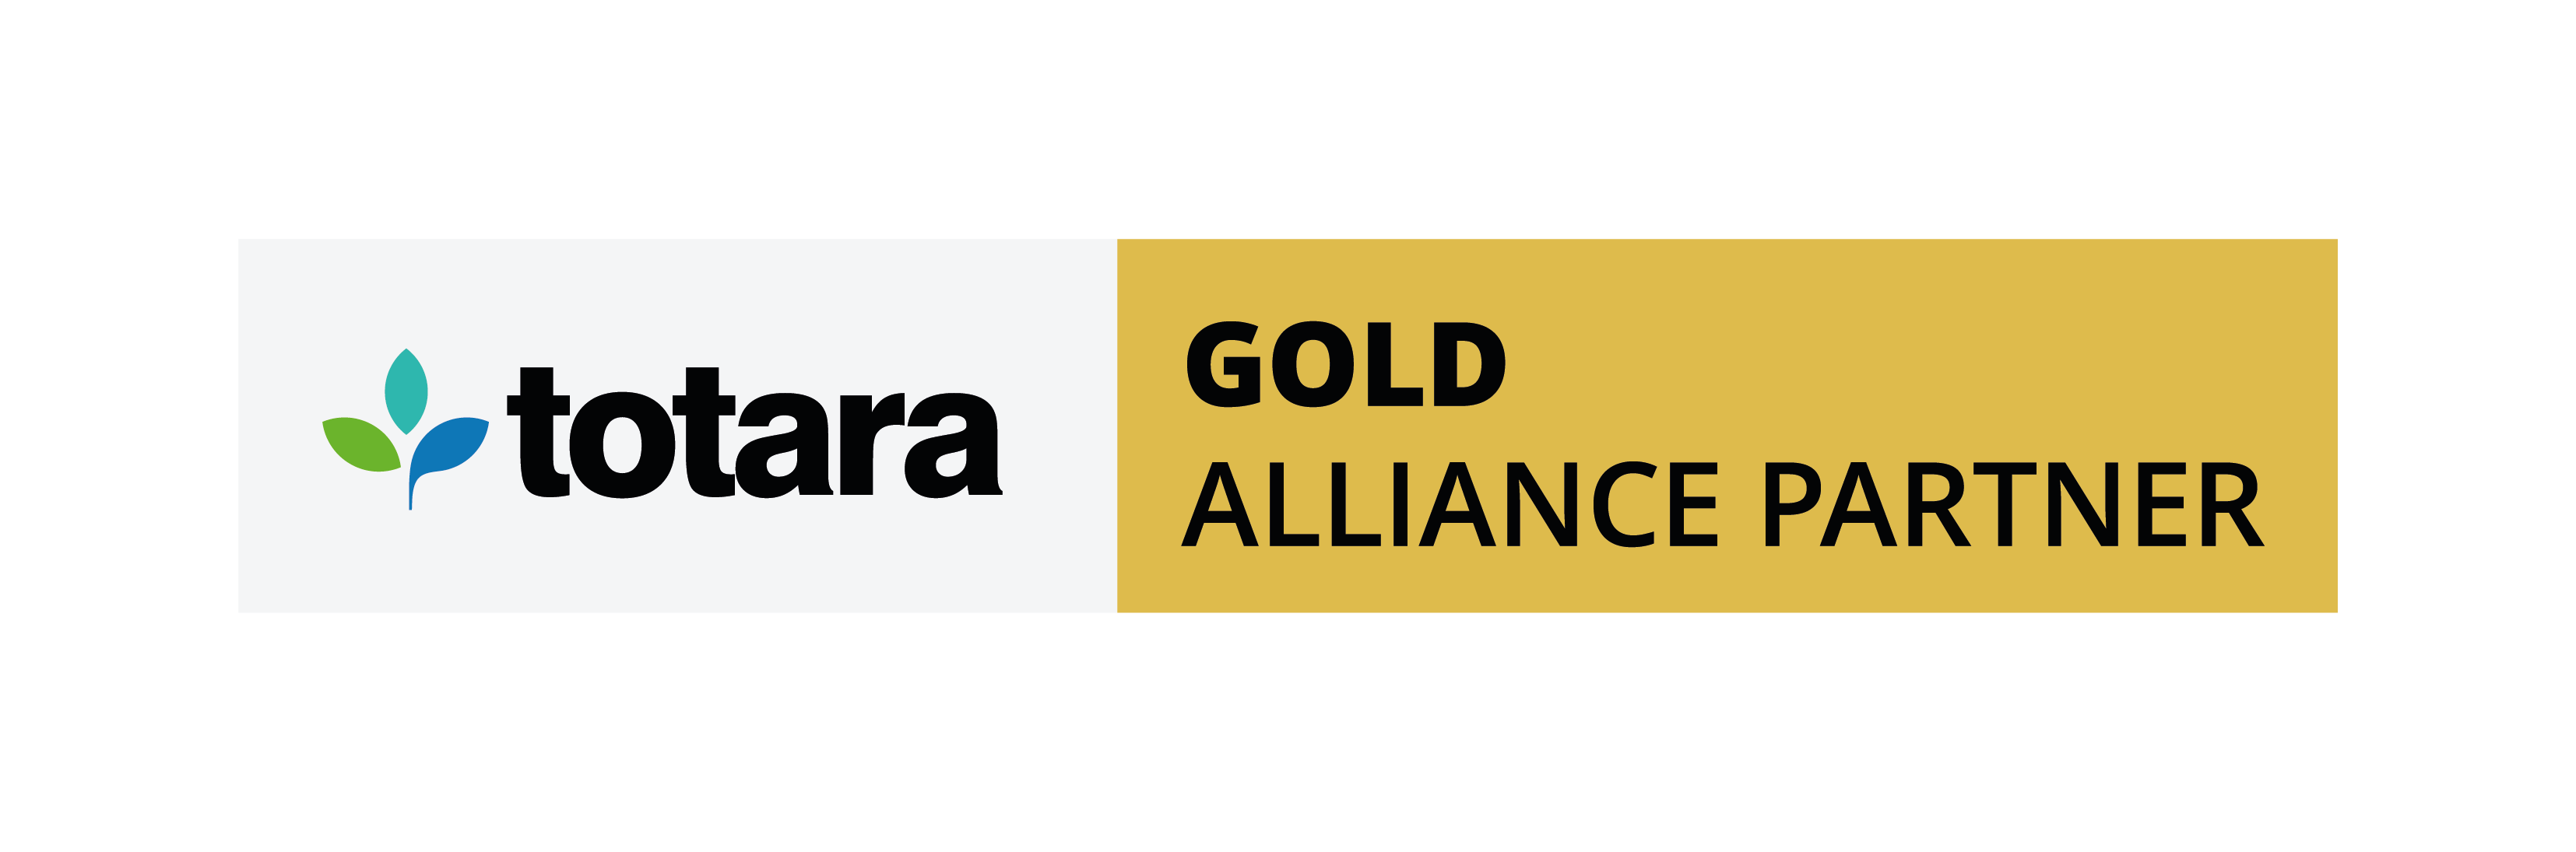 Totara Alliance Partner Status Logo Landscape Gold